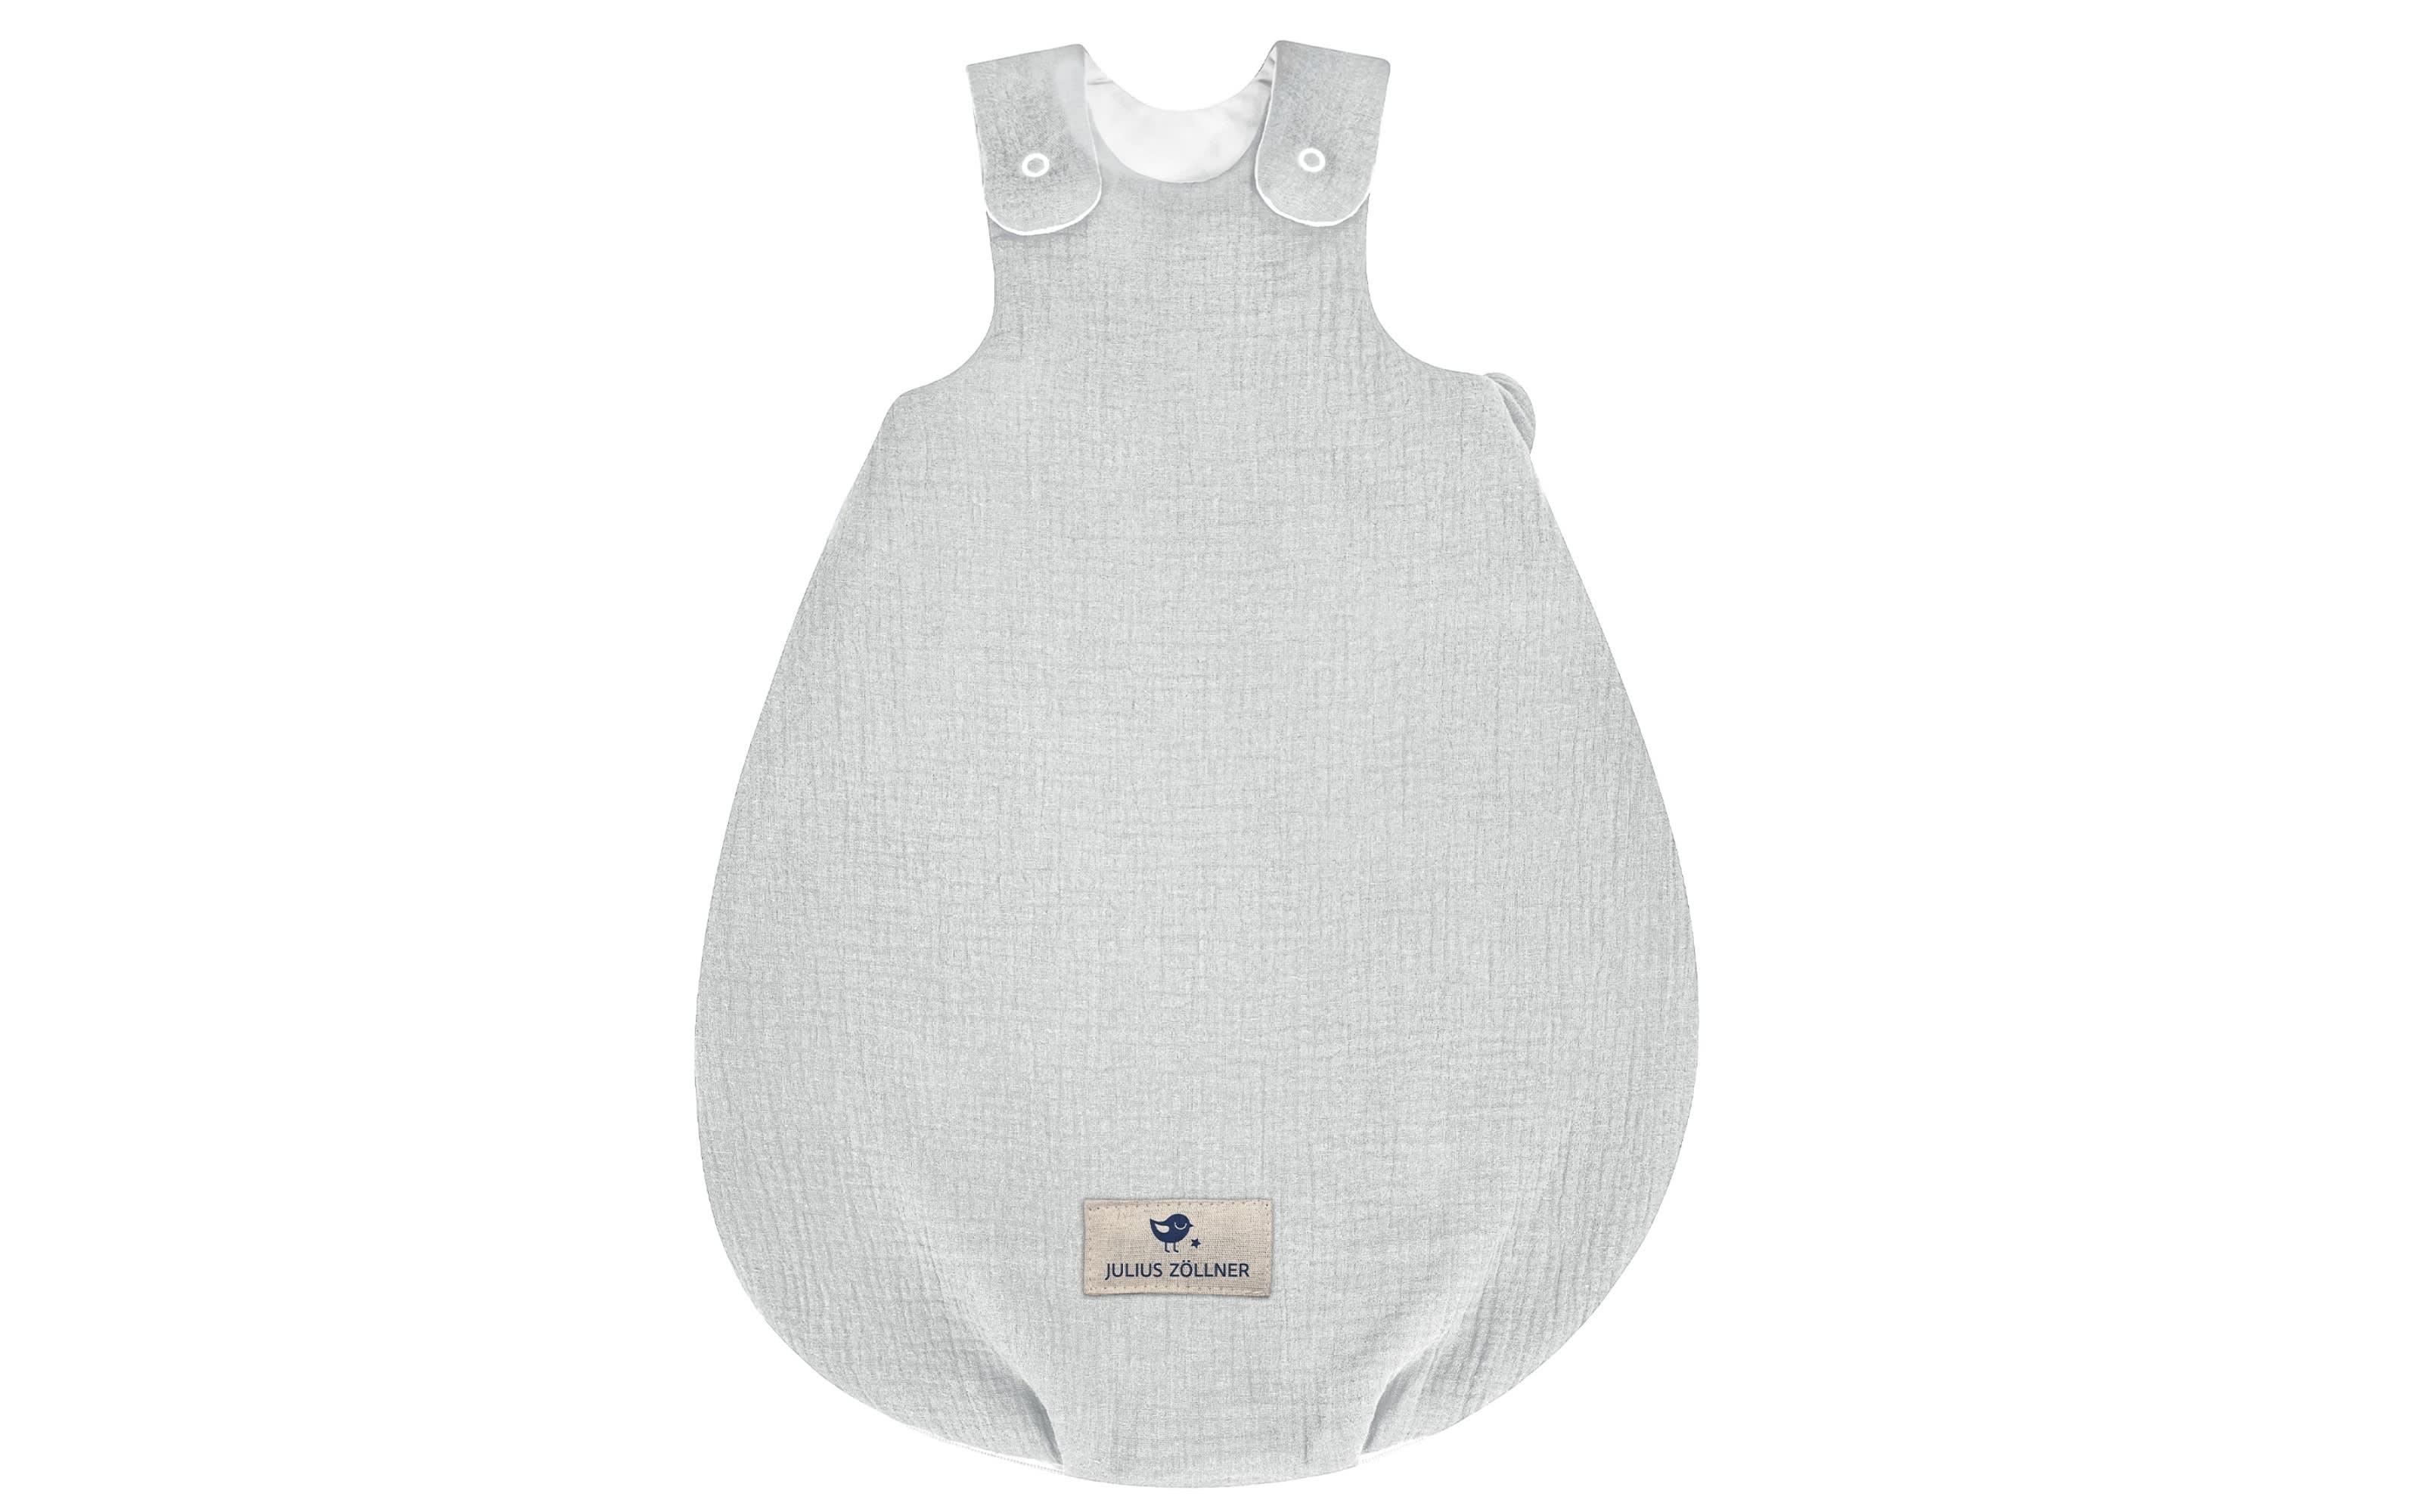 Babyschlafsack Terra in grau